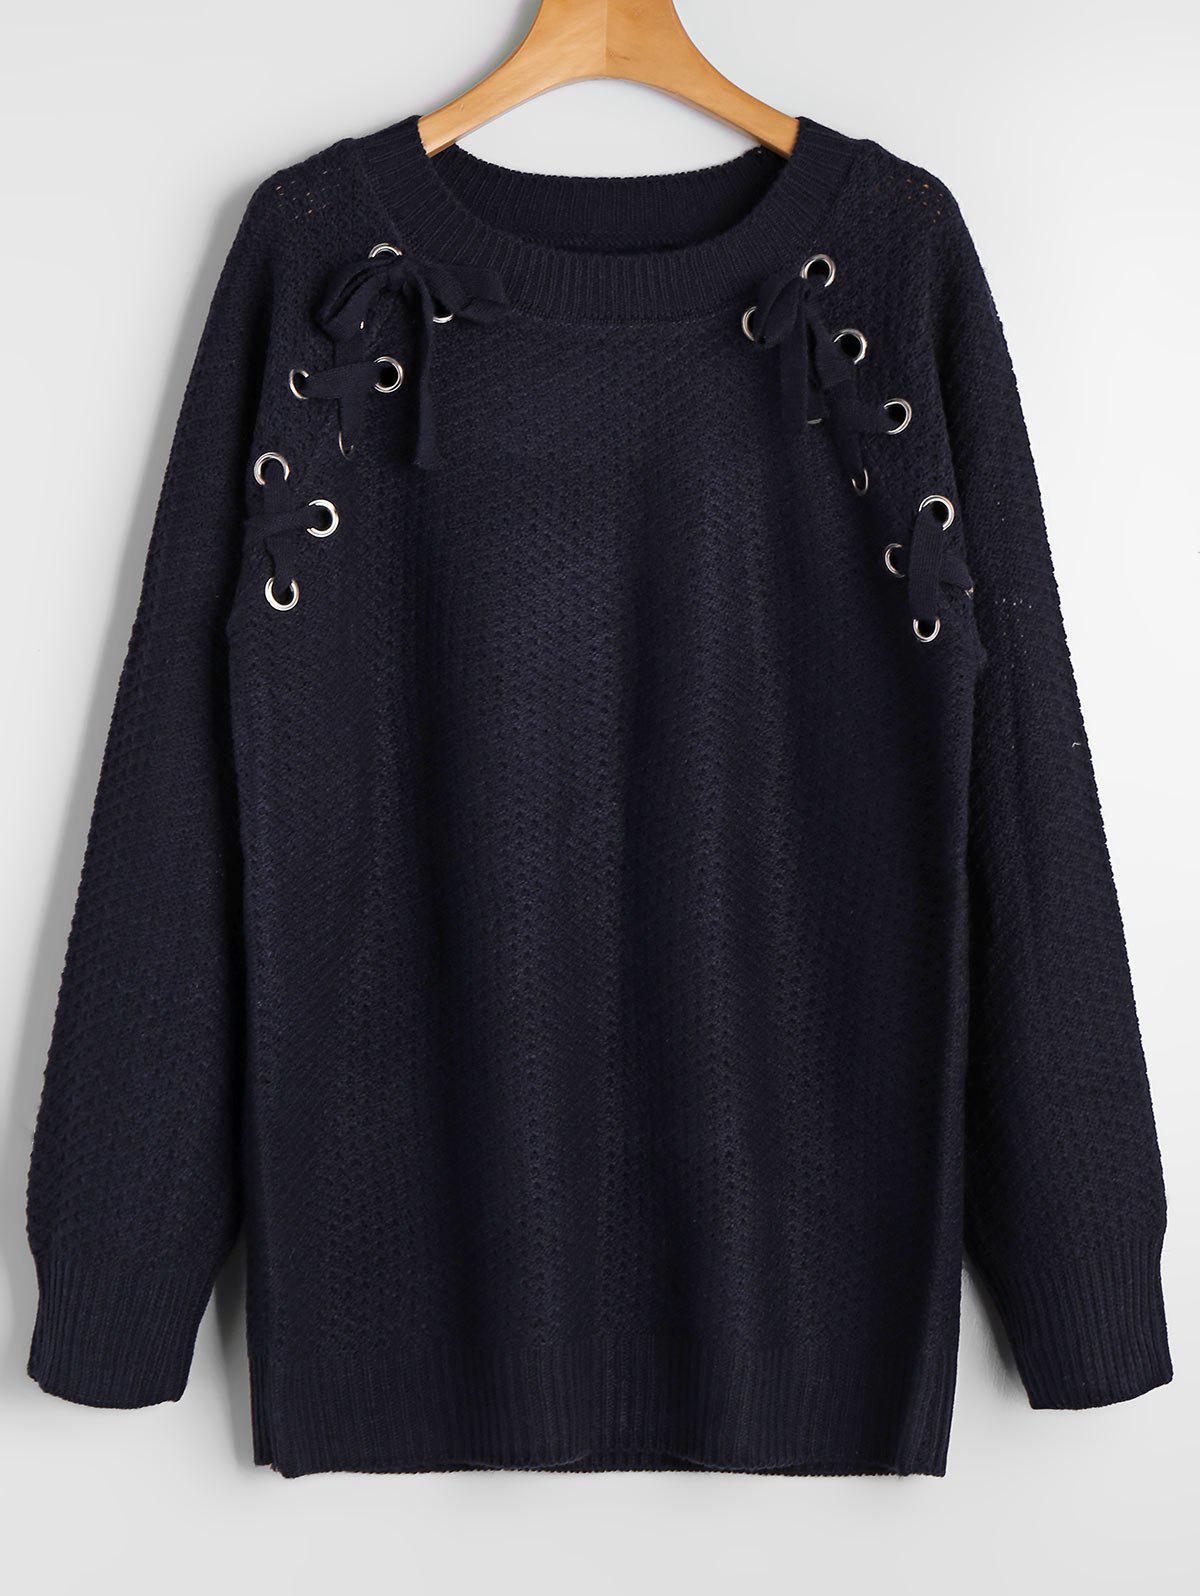 Loose Lace Up Raglan Sleeve Sweater 225502101